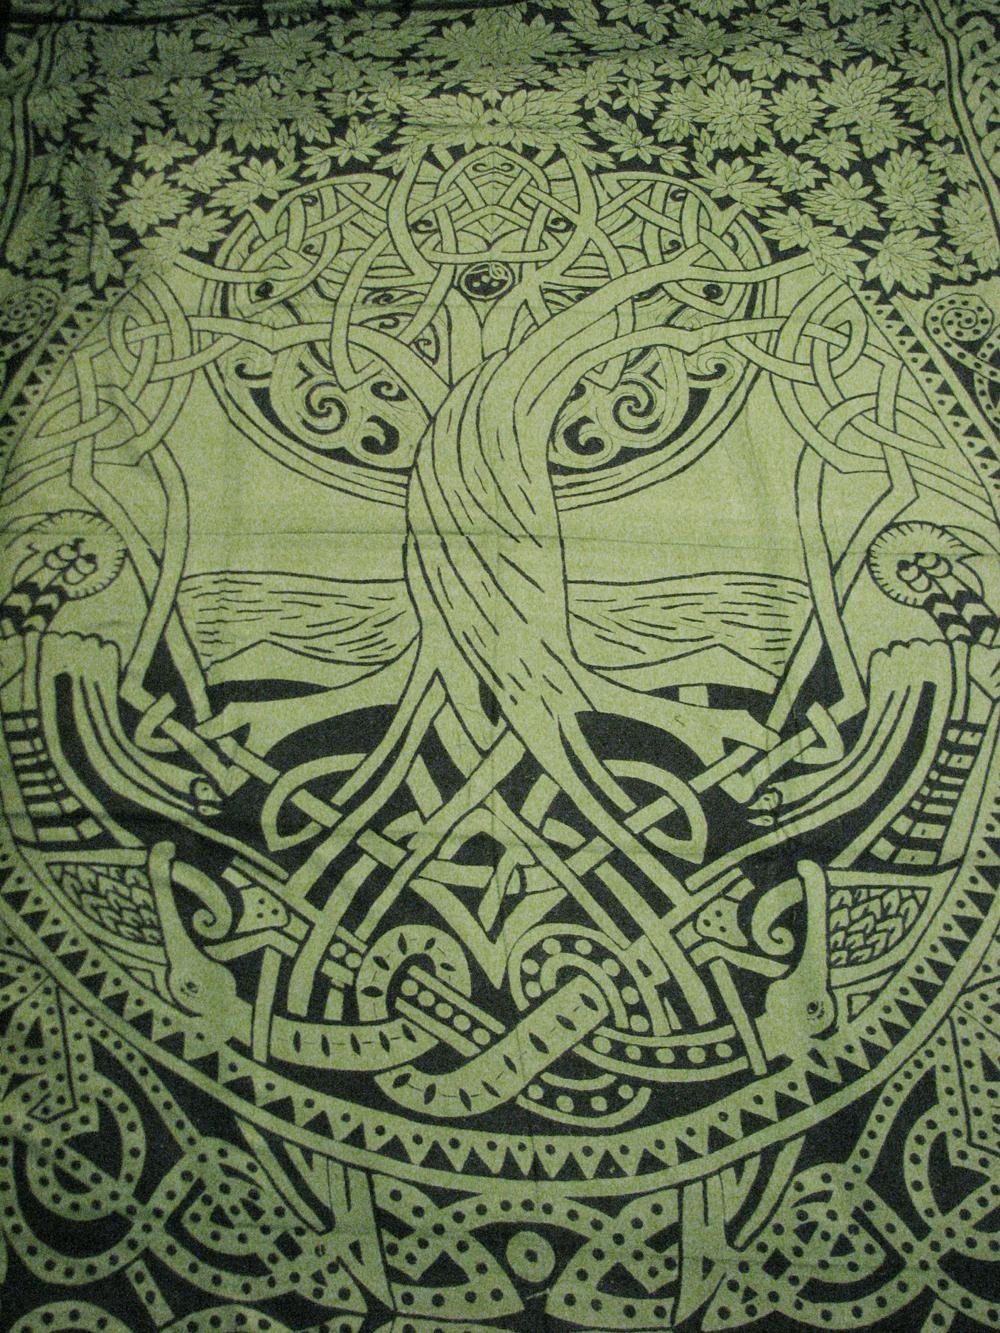 Celtic Tree Of Life Infinity Knot Druid Pagan Tapestry Wall With Celtic Tree Of Life Wall Art (View 7 of 20)